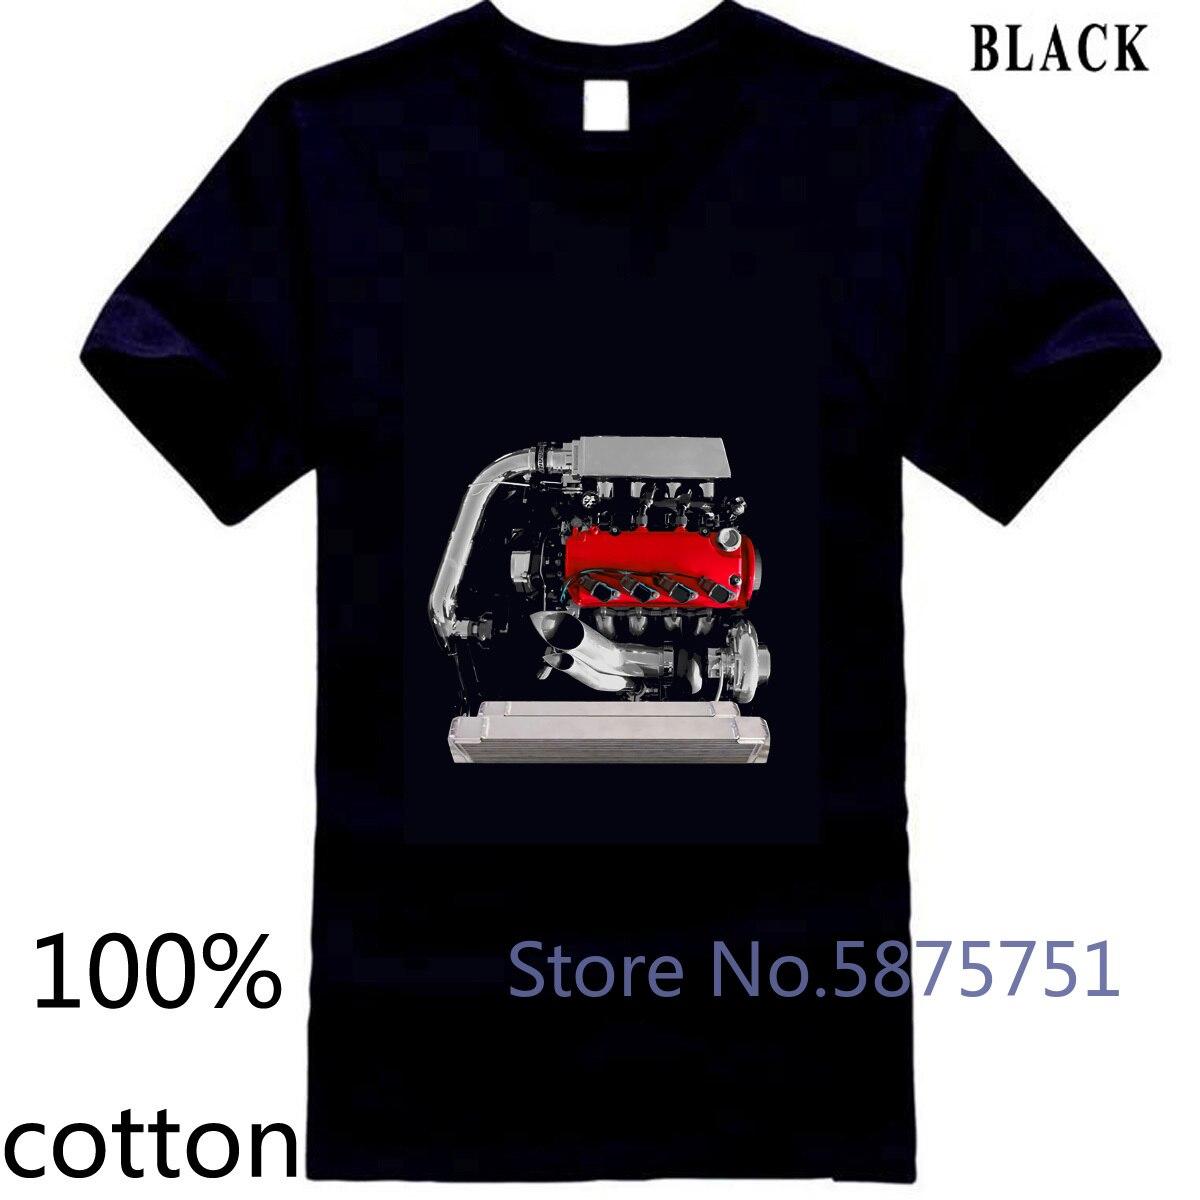 Serie D TURBO JDM D16 Motor t3t4 t4 Turbo Kit Golden Eagle colector nueva impresión de hombres camiseta tops camisetas 100% algodón